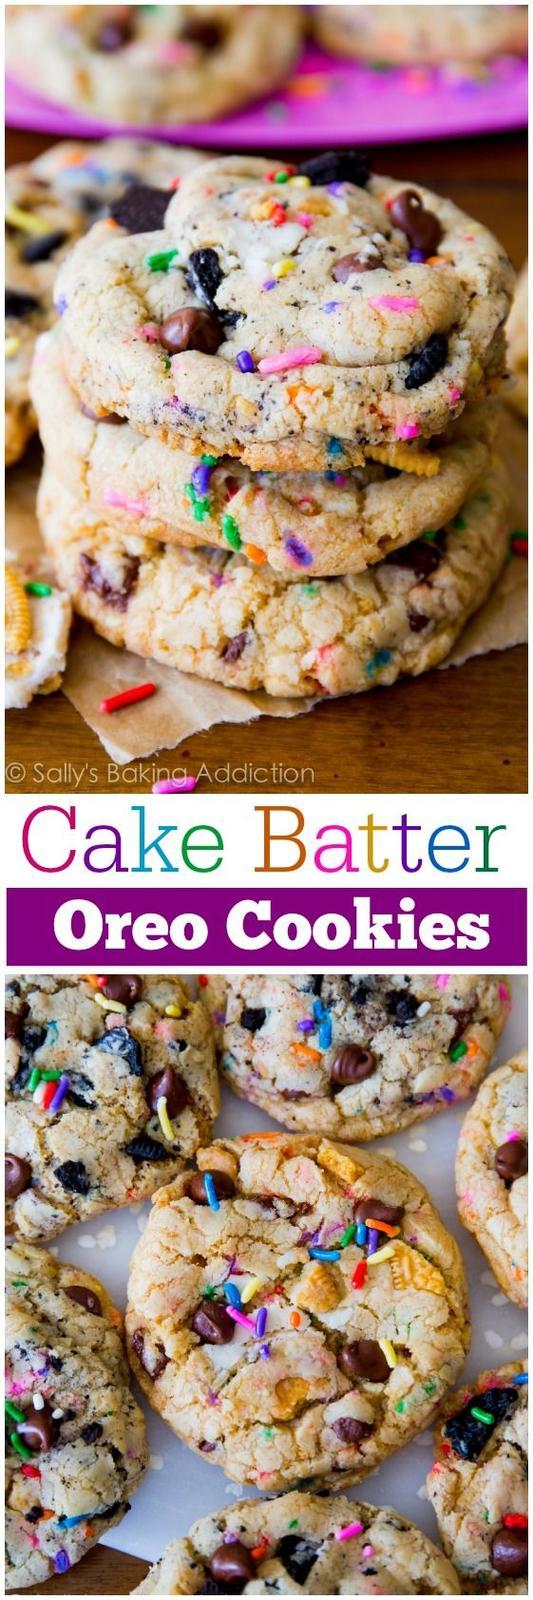 Americké koláčky - Cake Batter Oreo Cookies